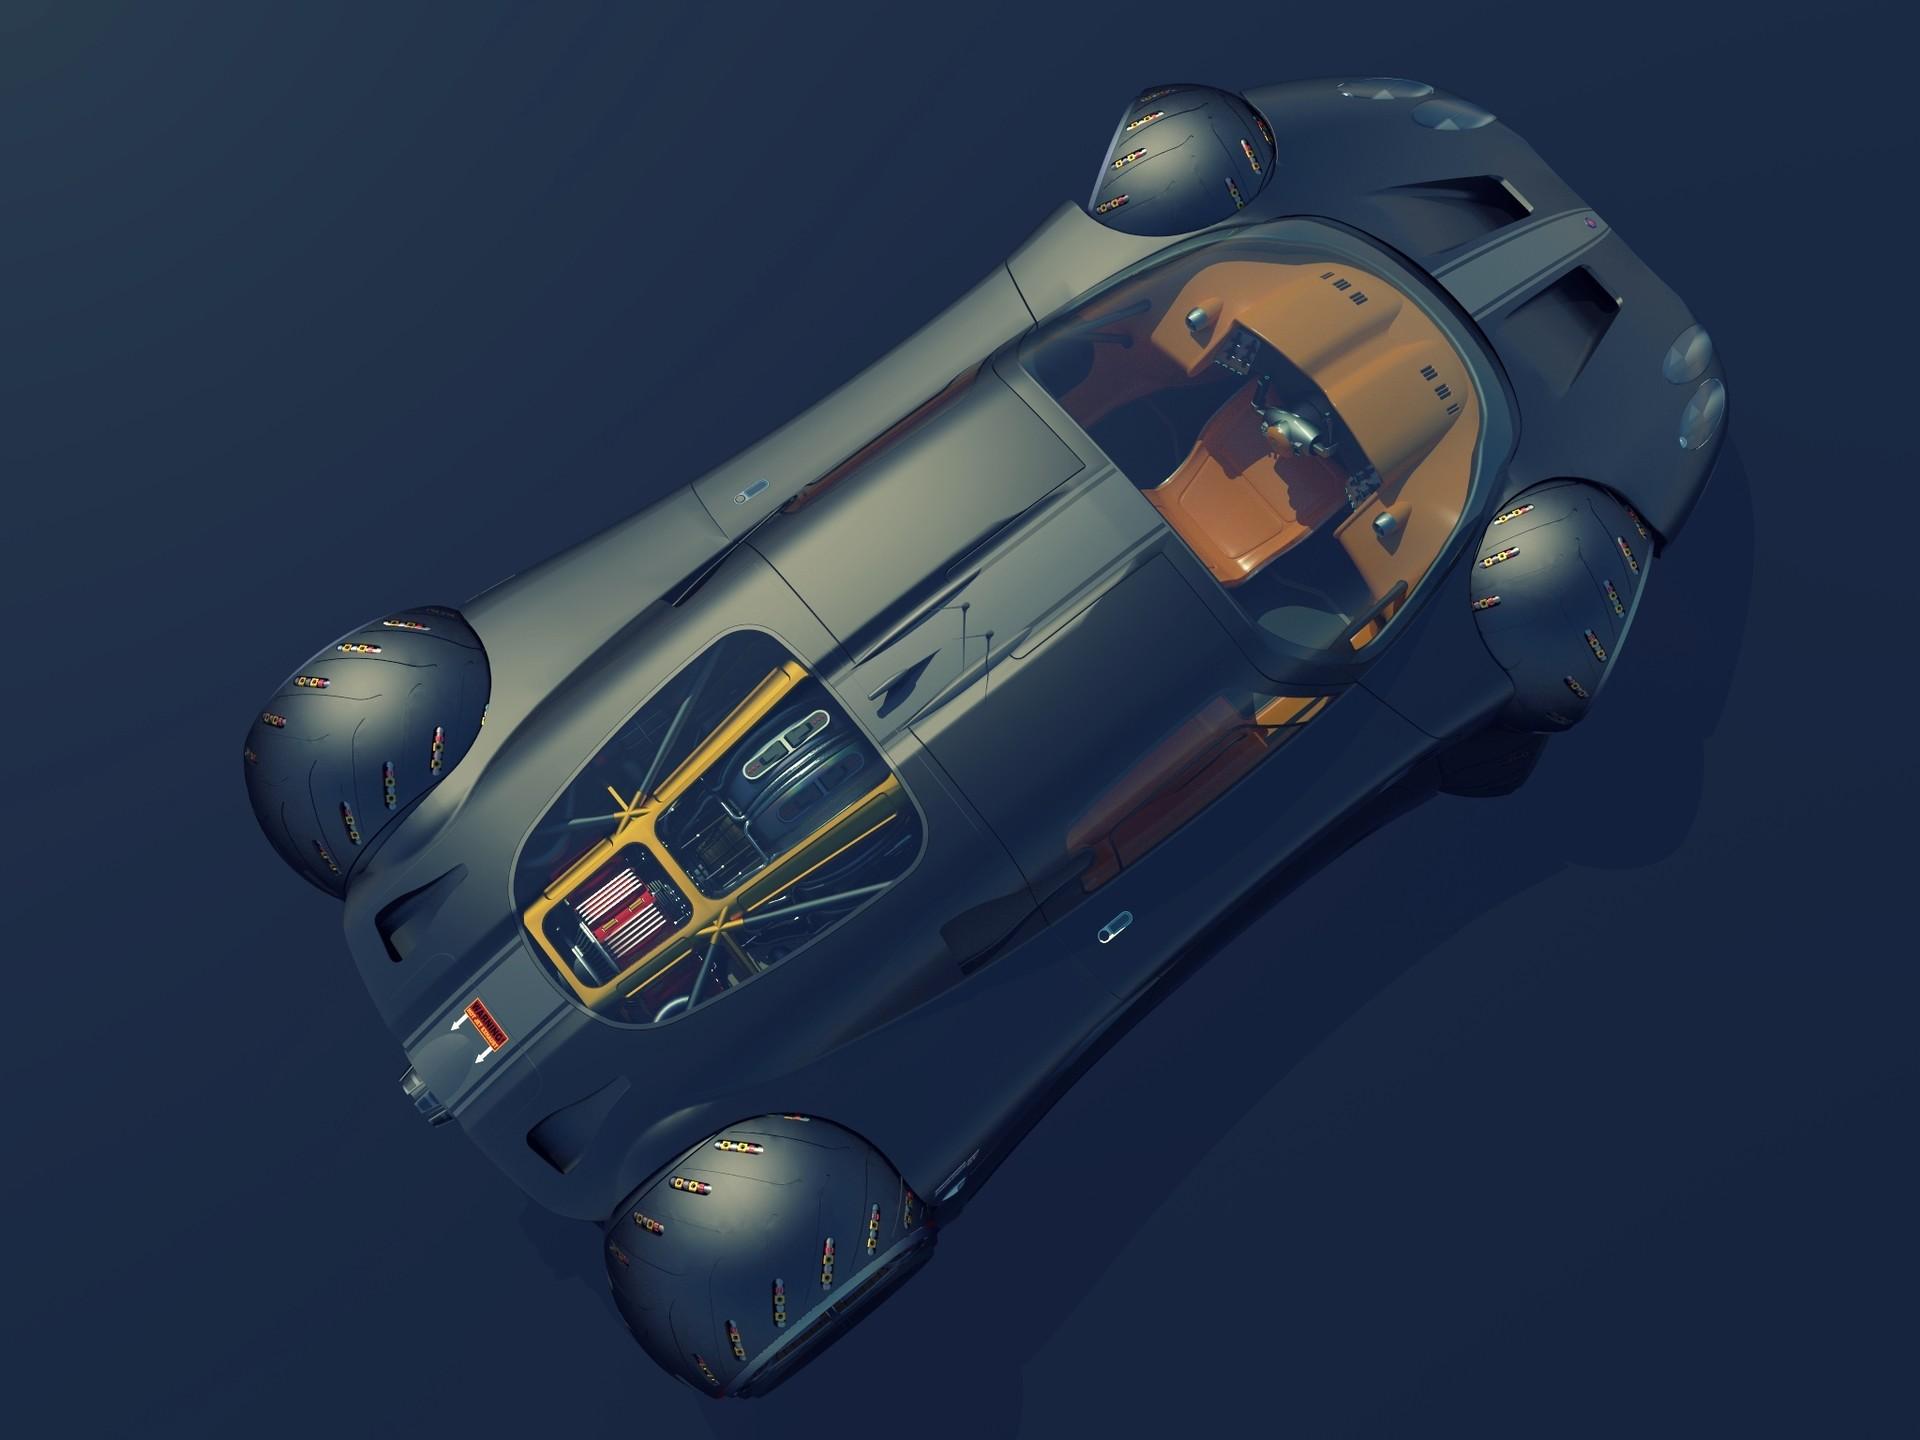 Joachim sverd supercar concept36